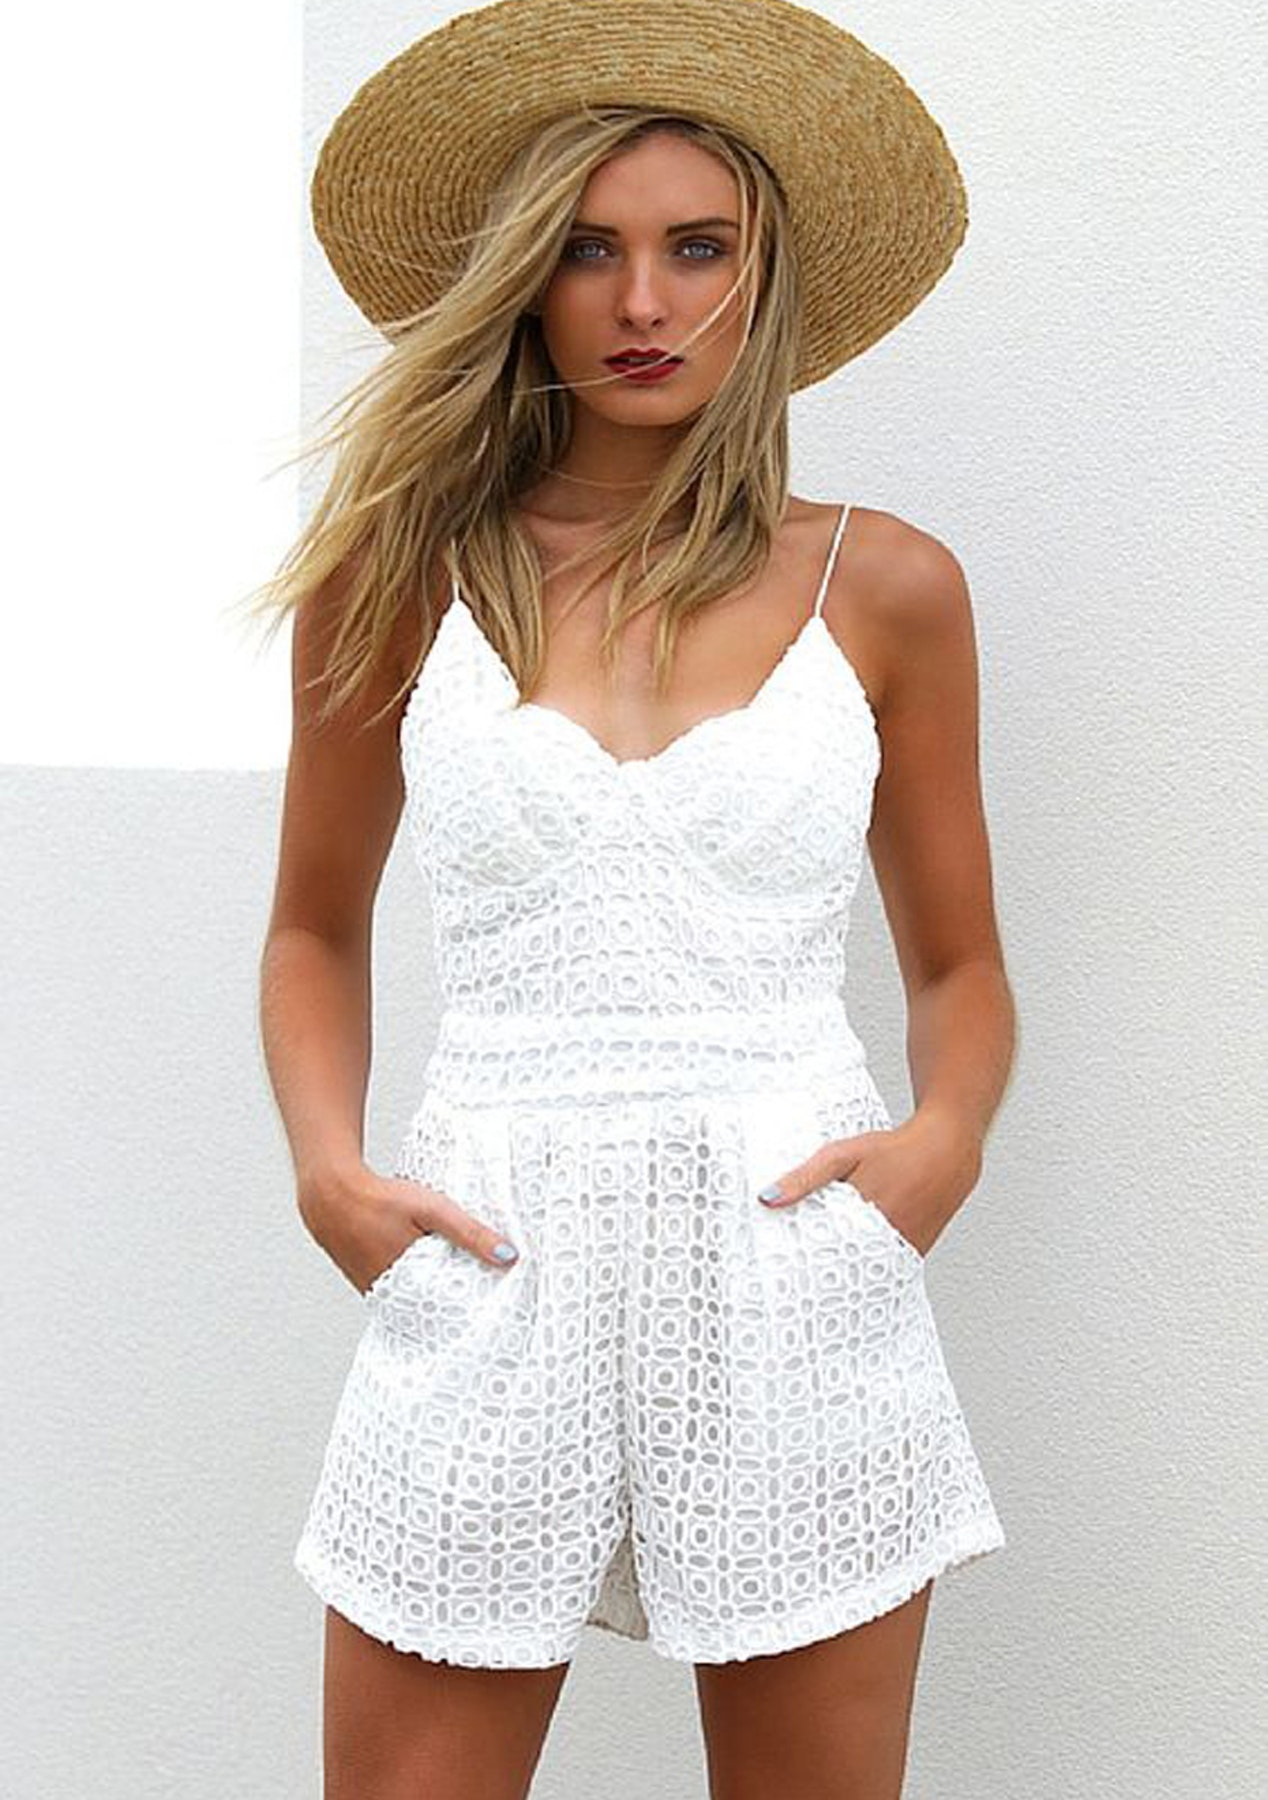 483ce6316ee Risky Business Romper - White - Garage Sale - Fashion - Onceit